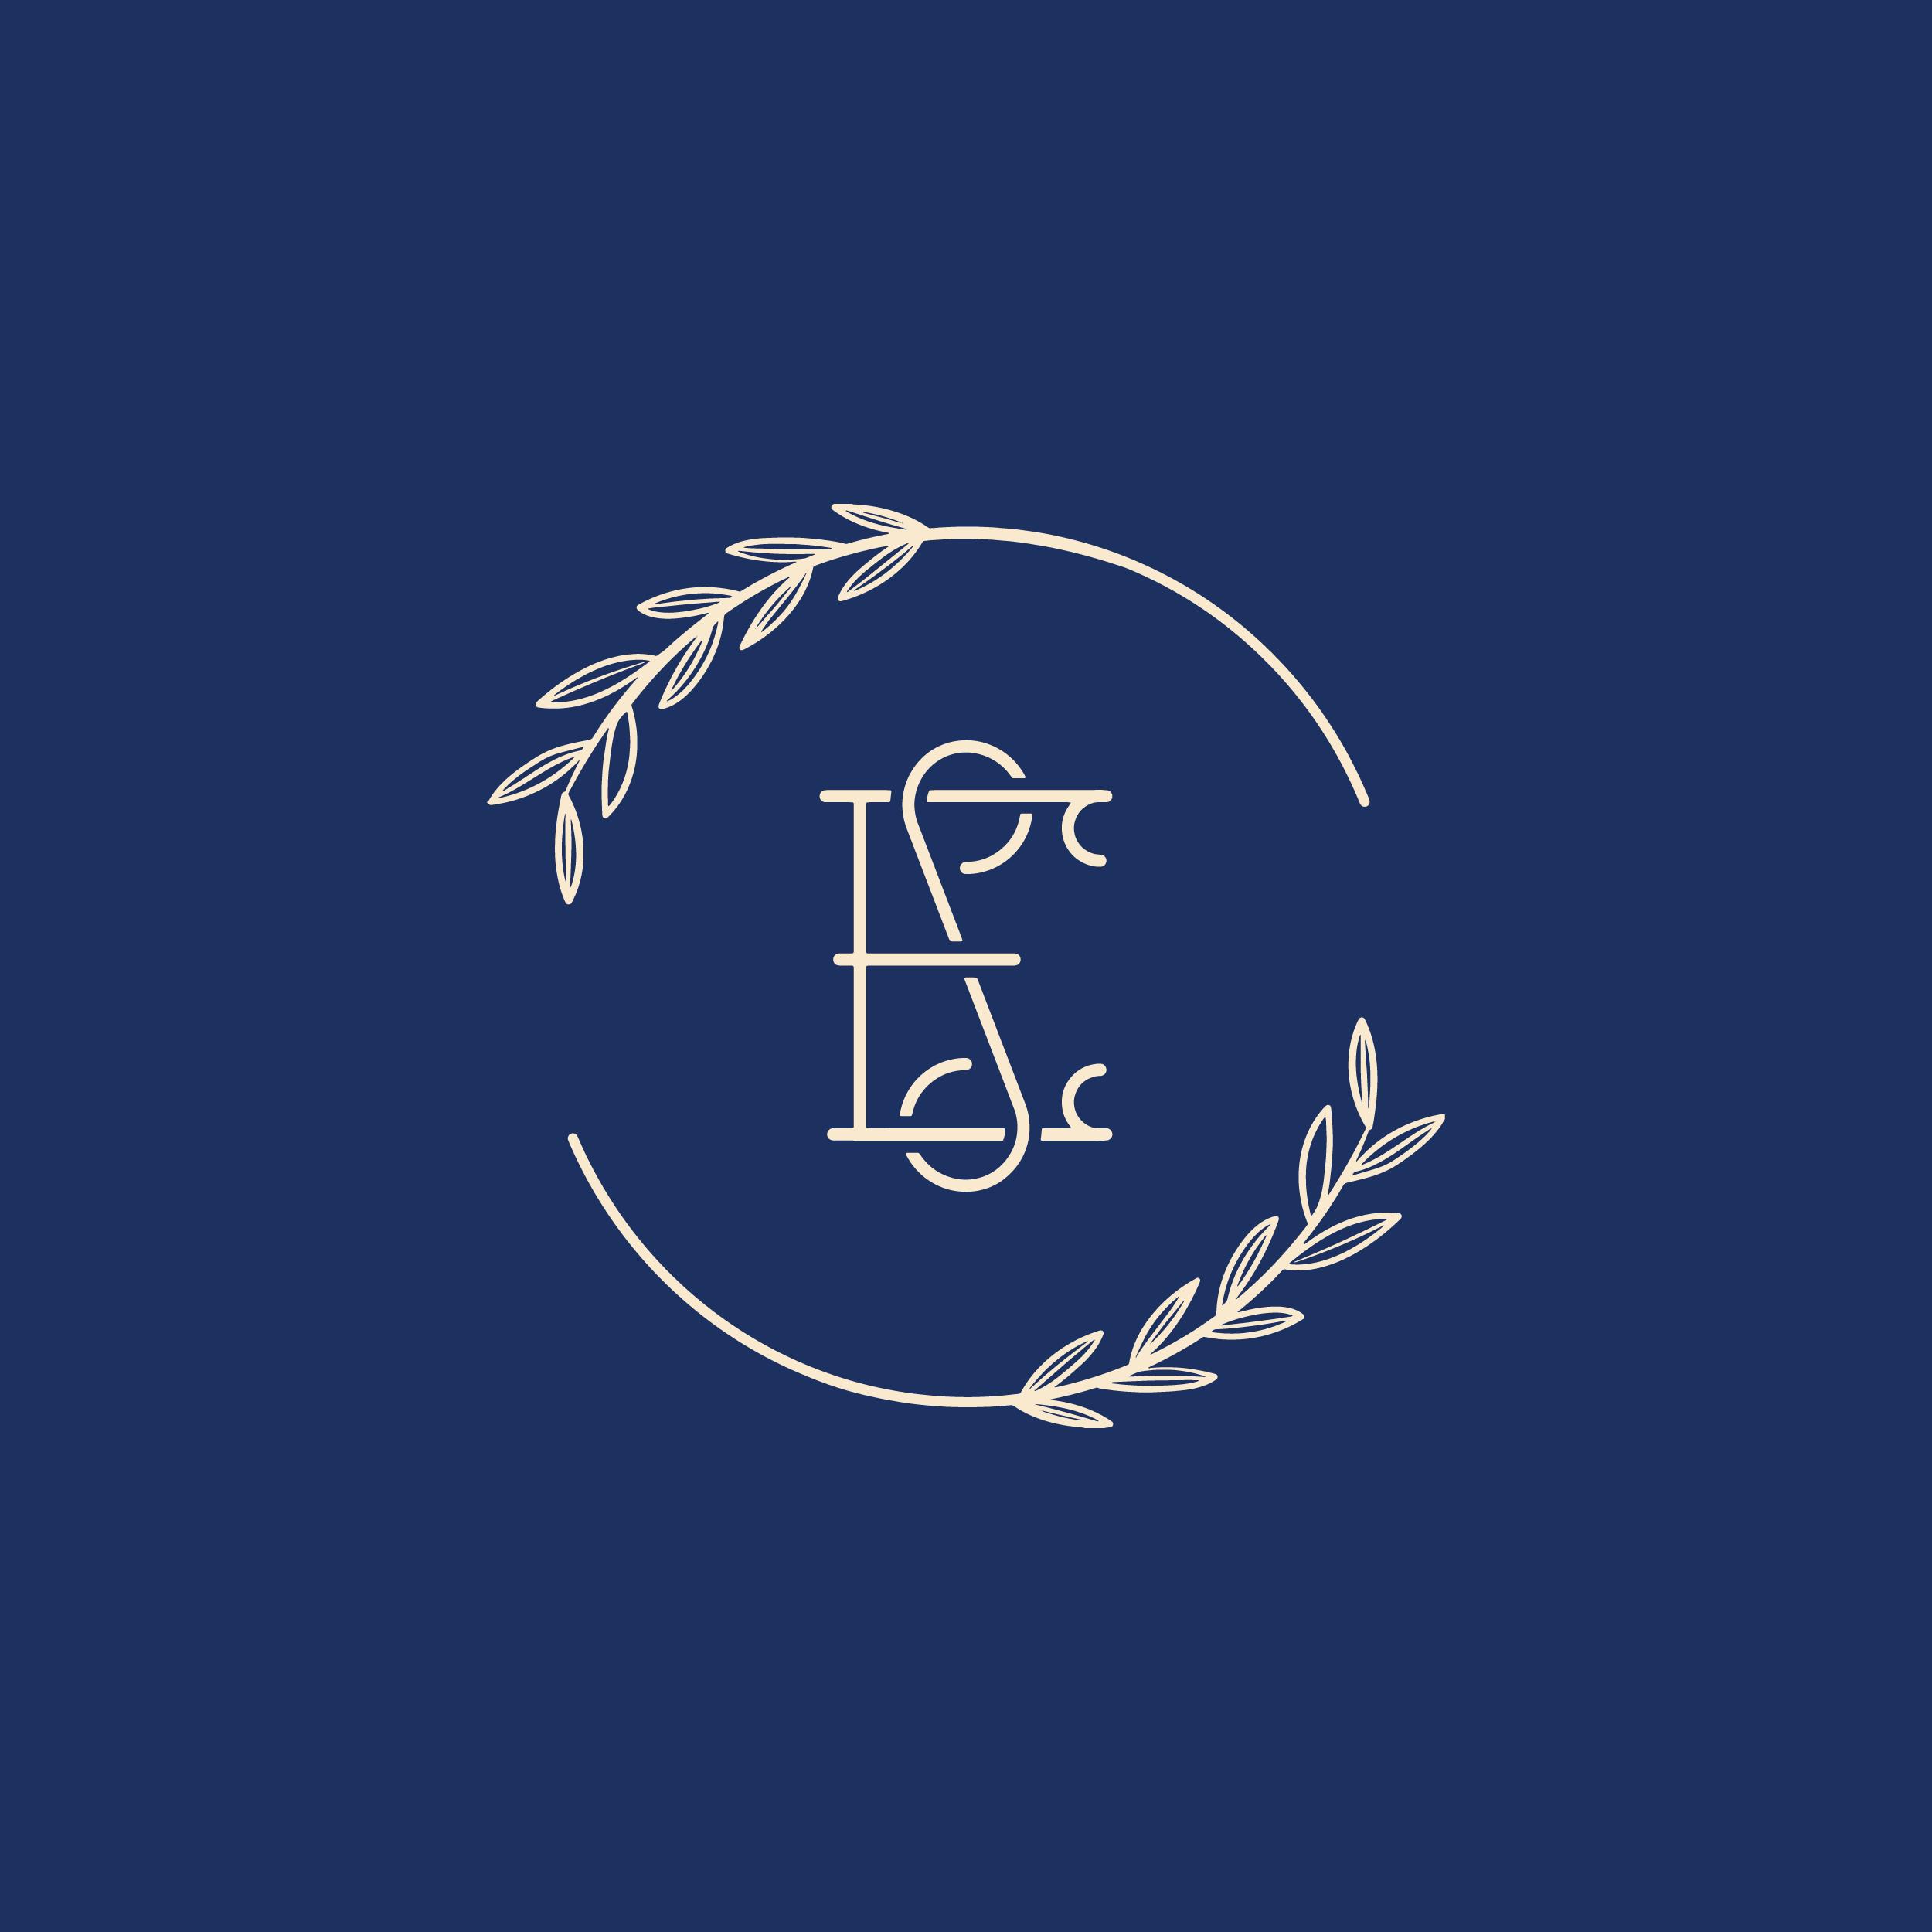 es_decorative-monogram.png